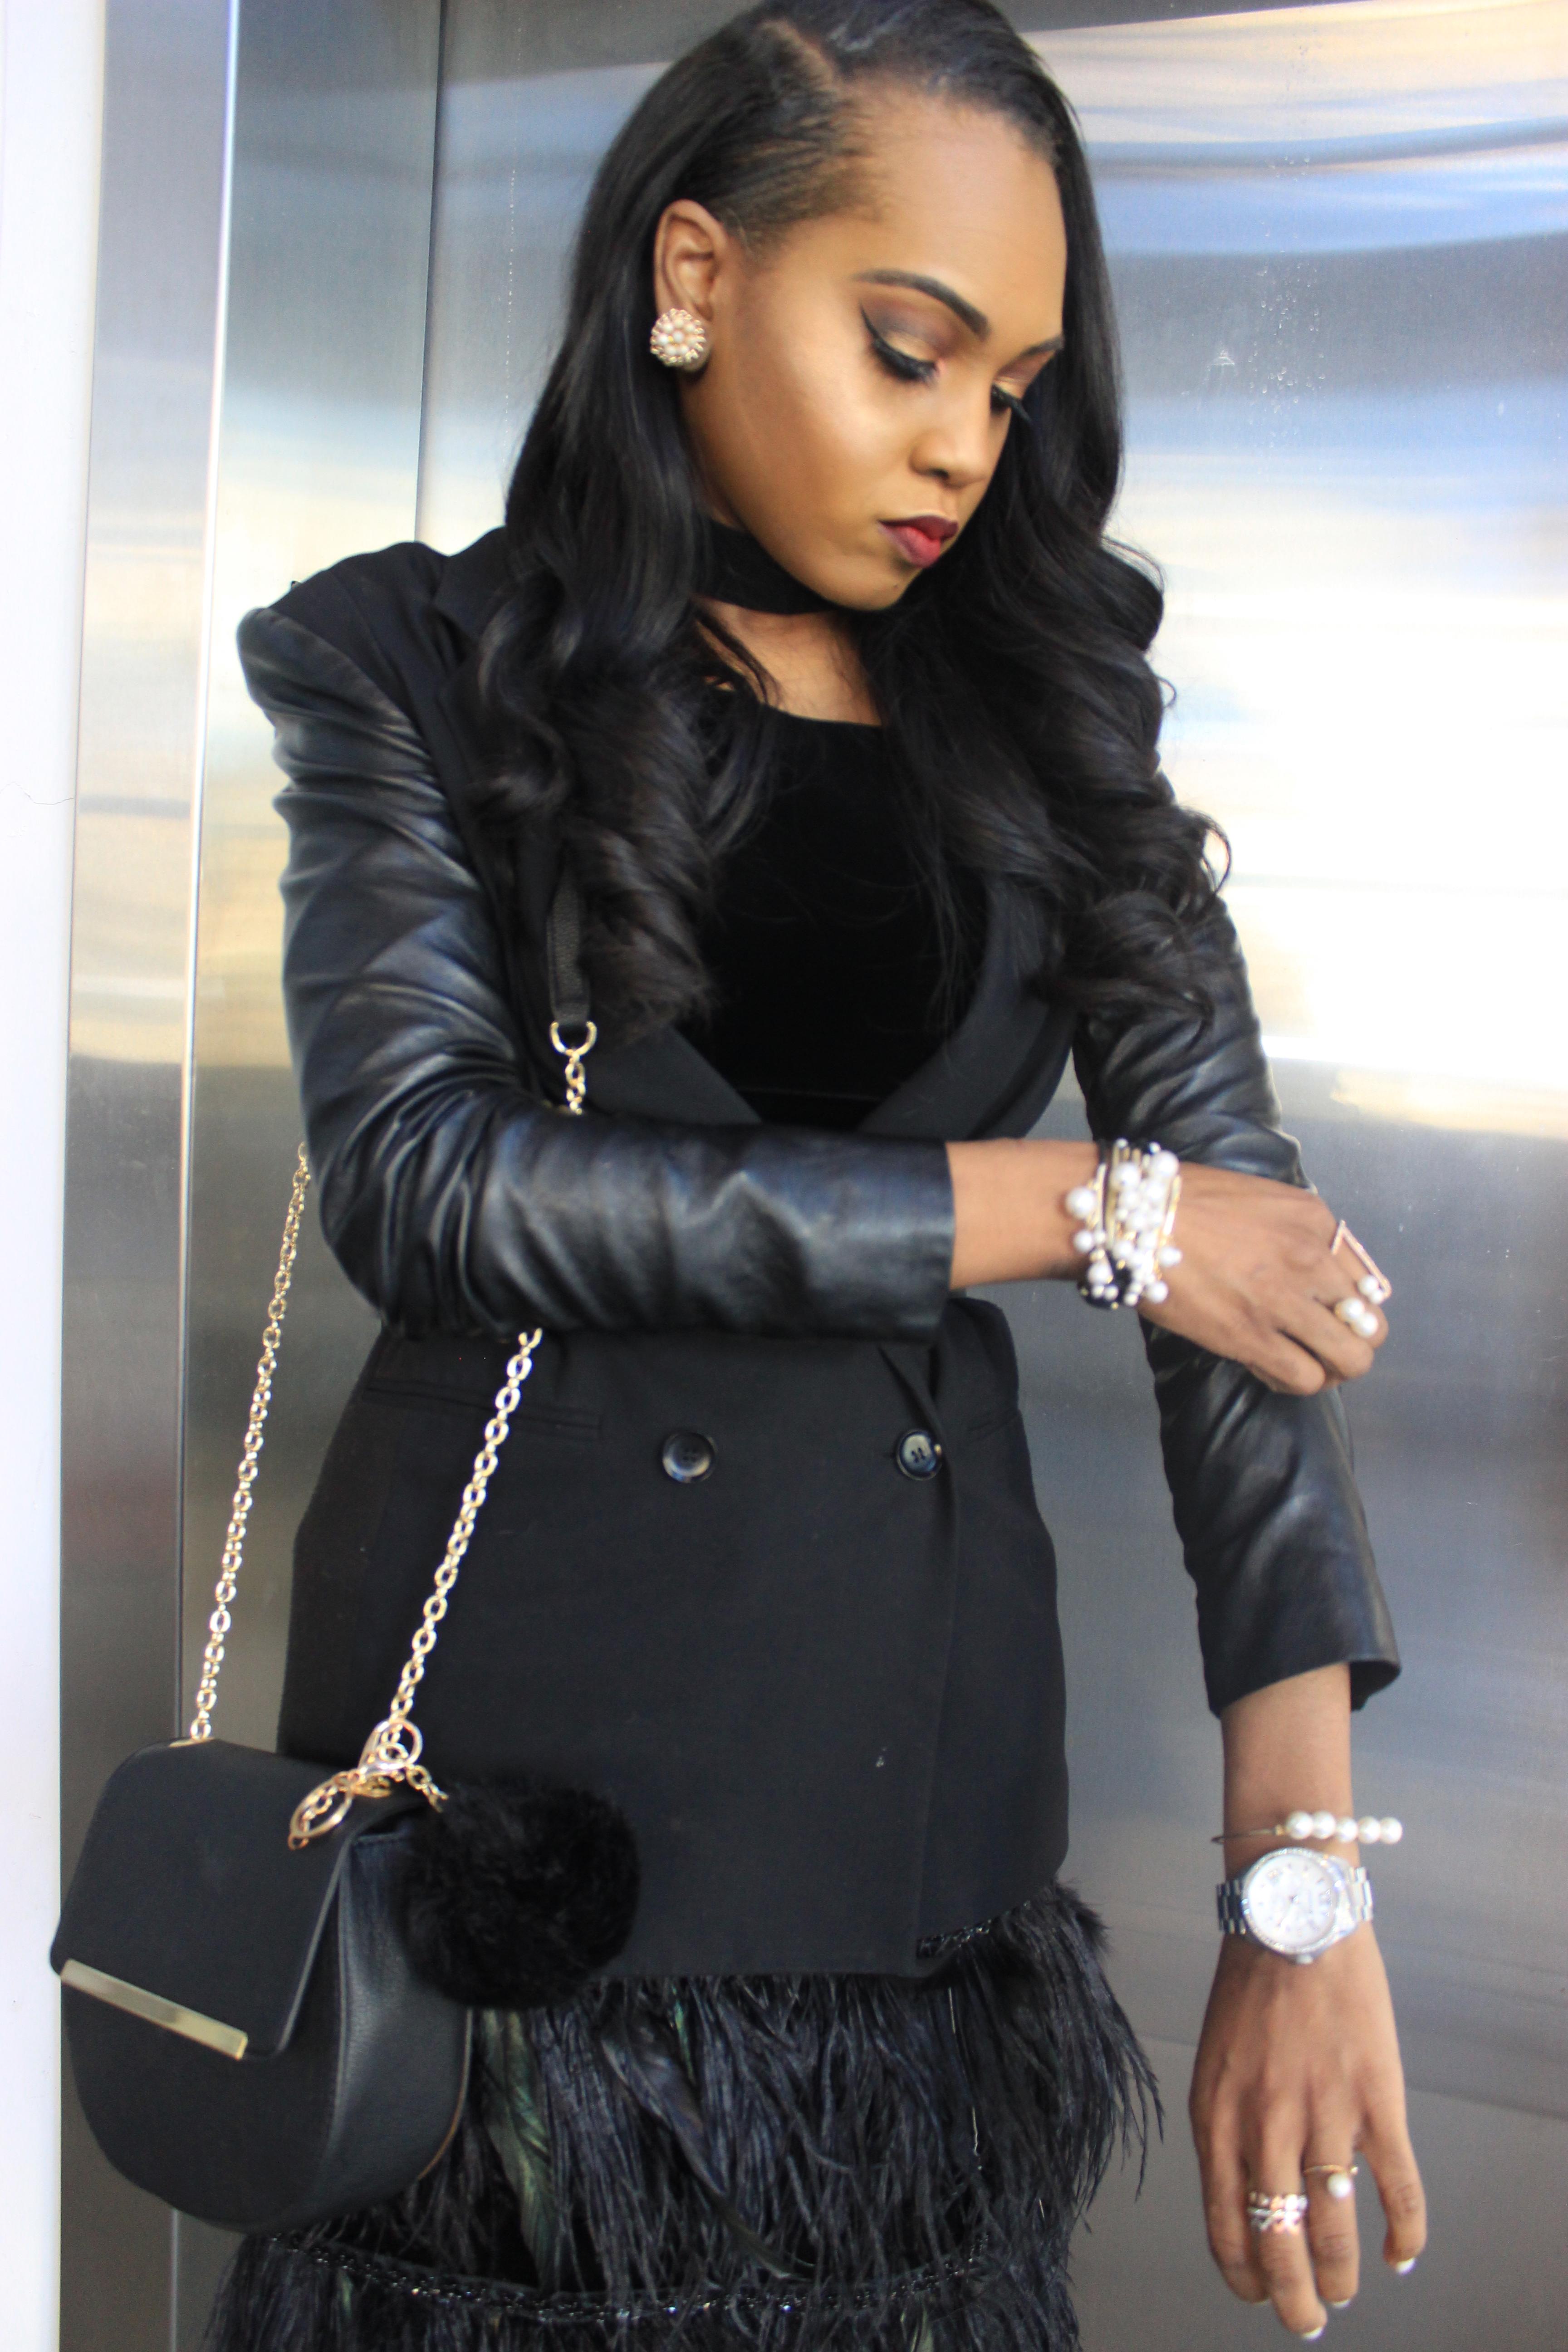 Style-Files-Victor-Costa-Vintage-velvet-Feather-Dress-BCBGMaxAzria-Leather-Sleeve-Blazer-JustFab-Hadley-black-bow-pumps-feather-hem-dress-oohlalablog-13